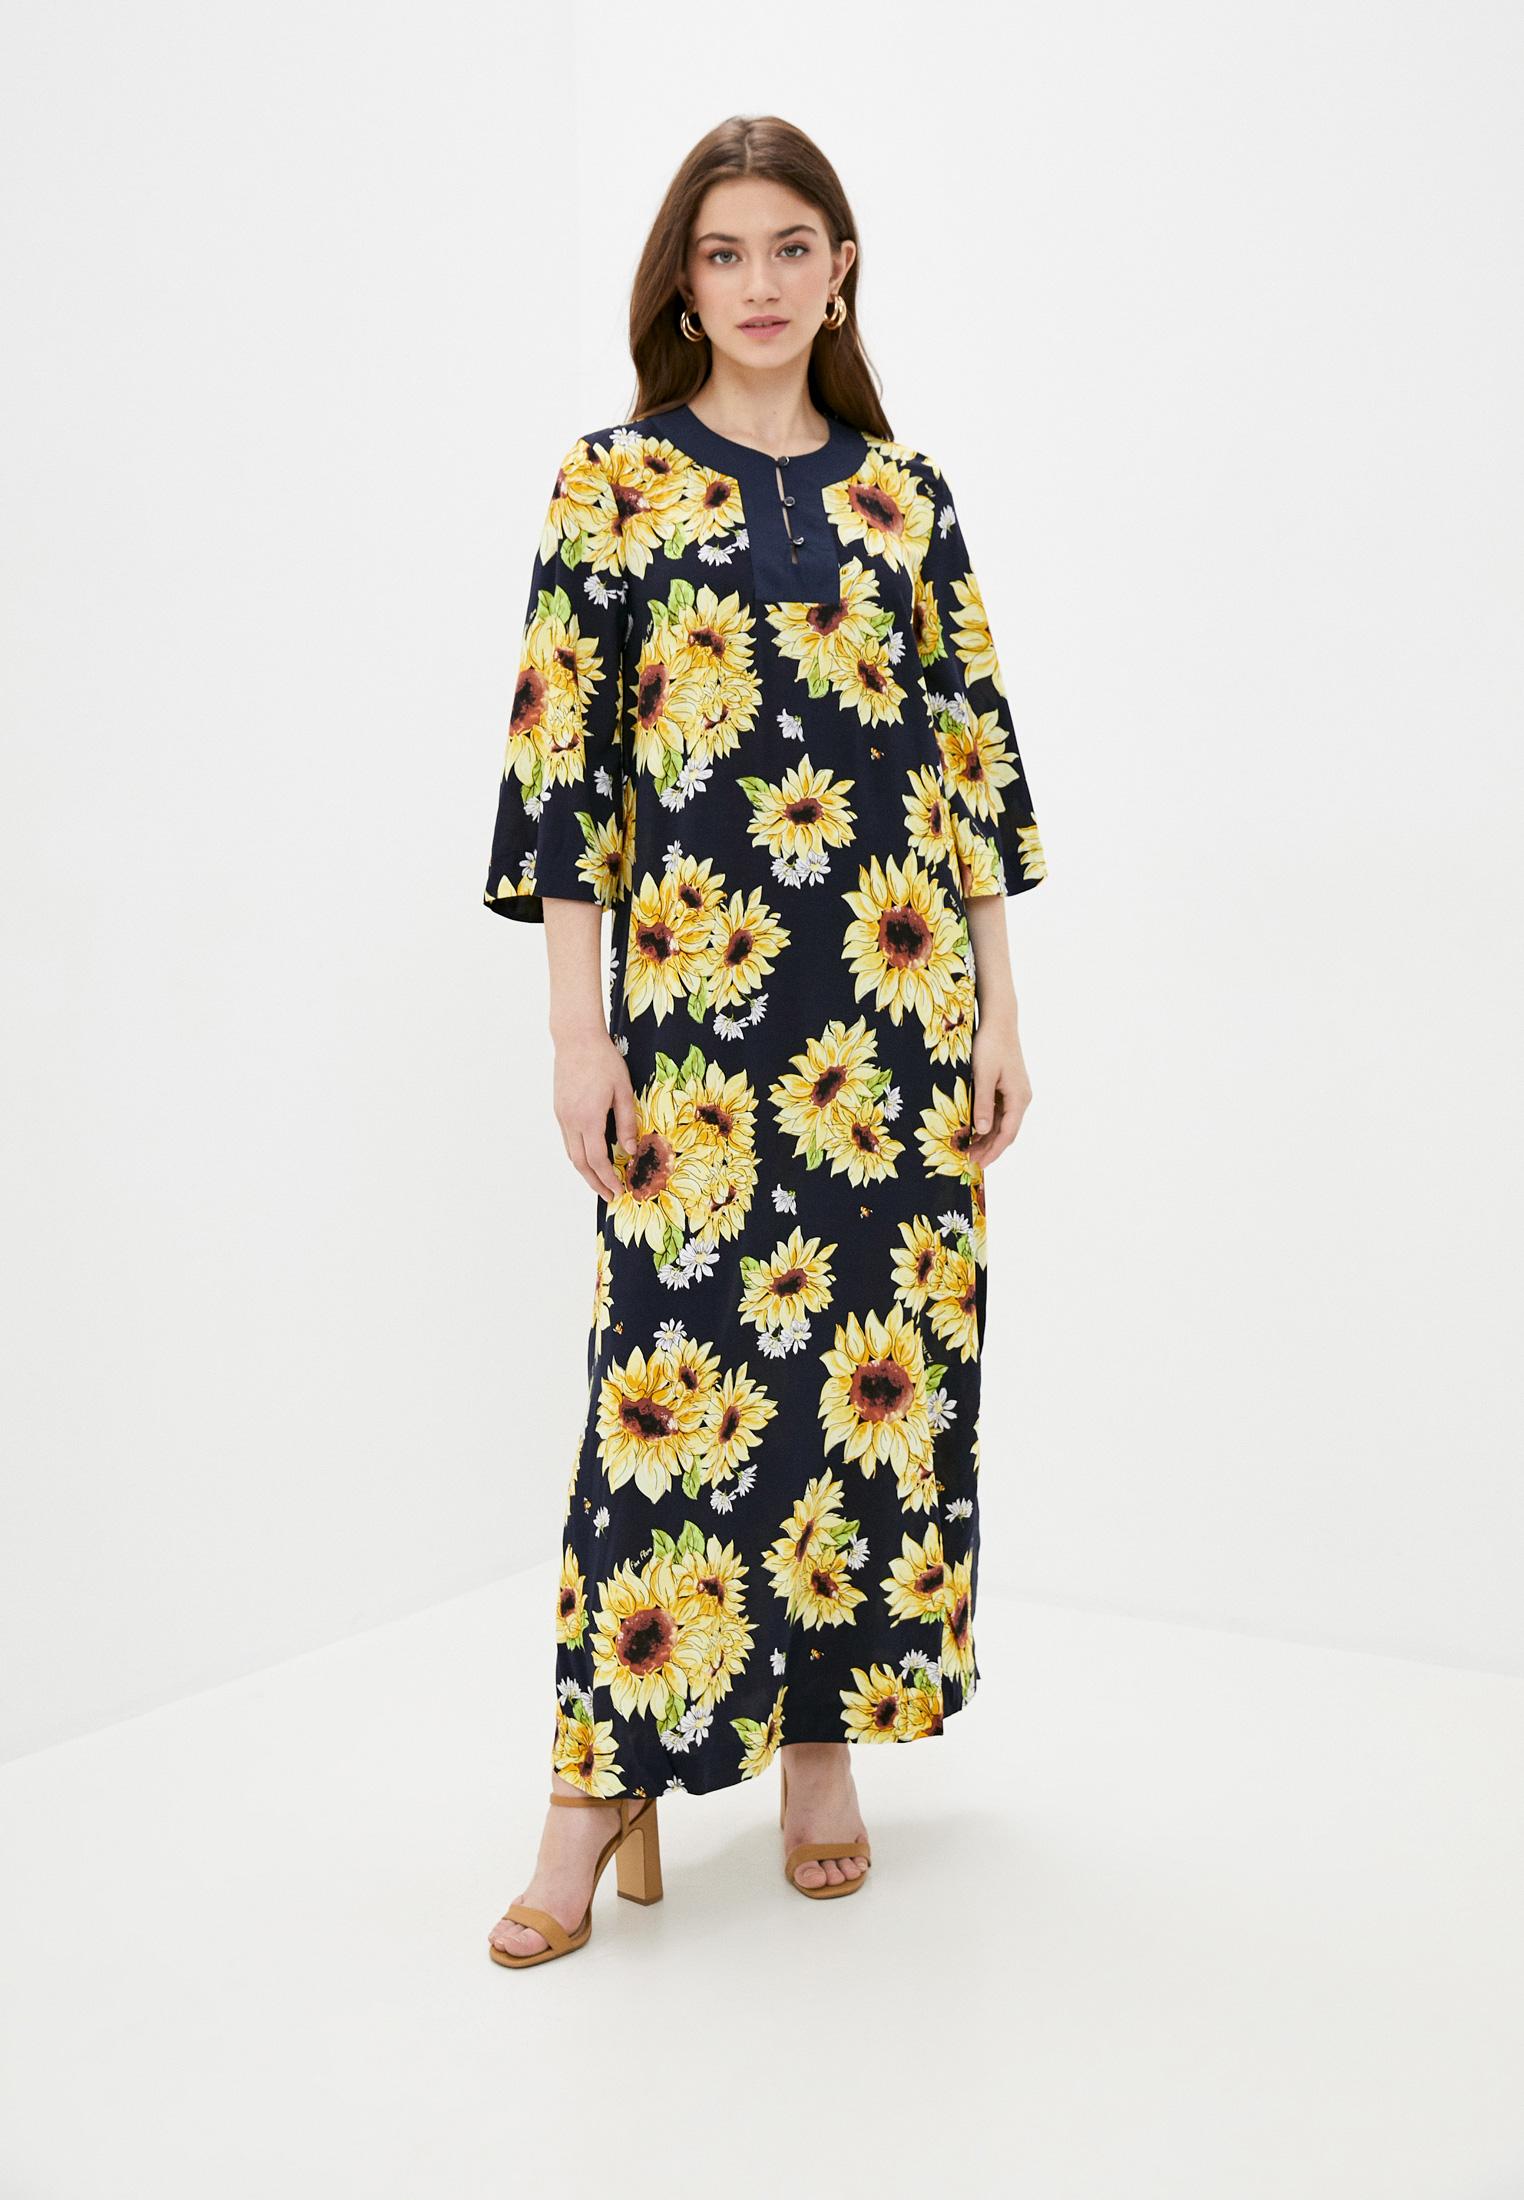 Платье Finn Flare (Фин Флаер) S18-14033